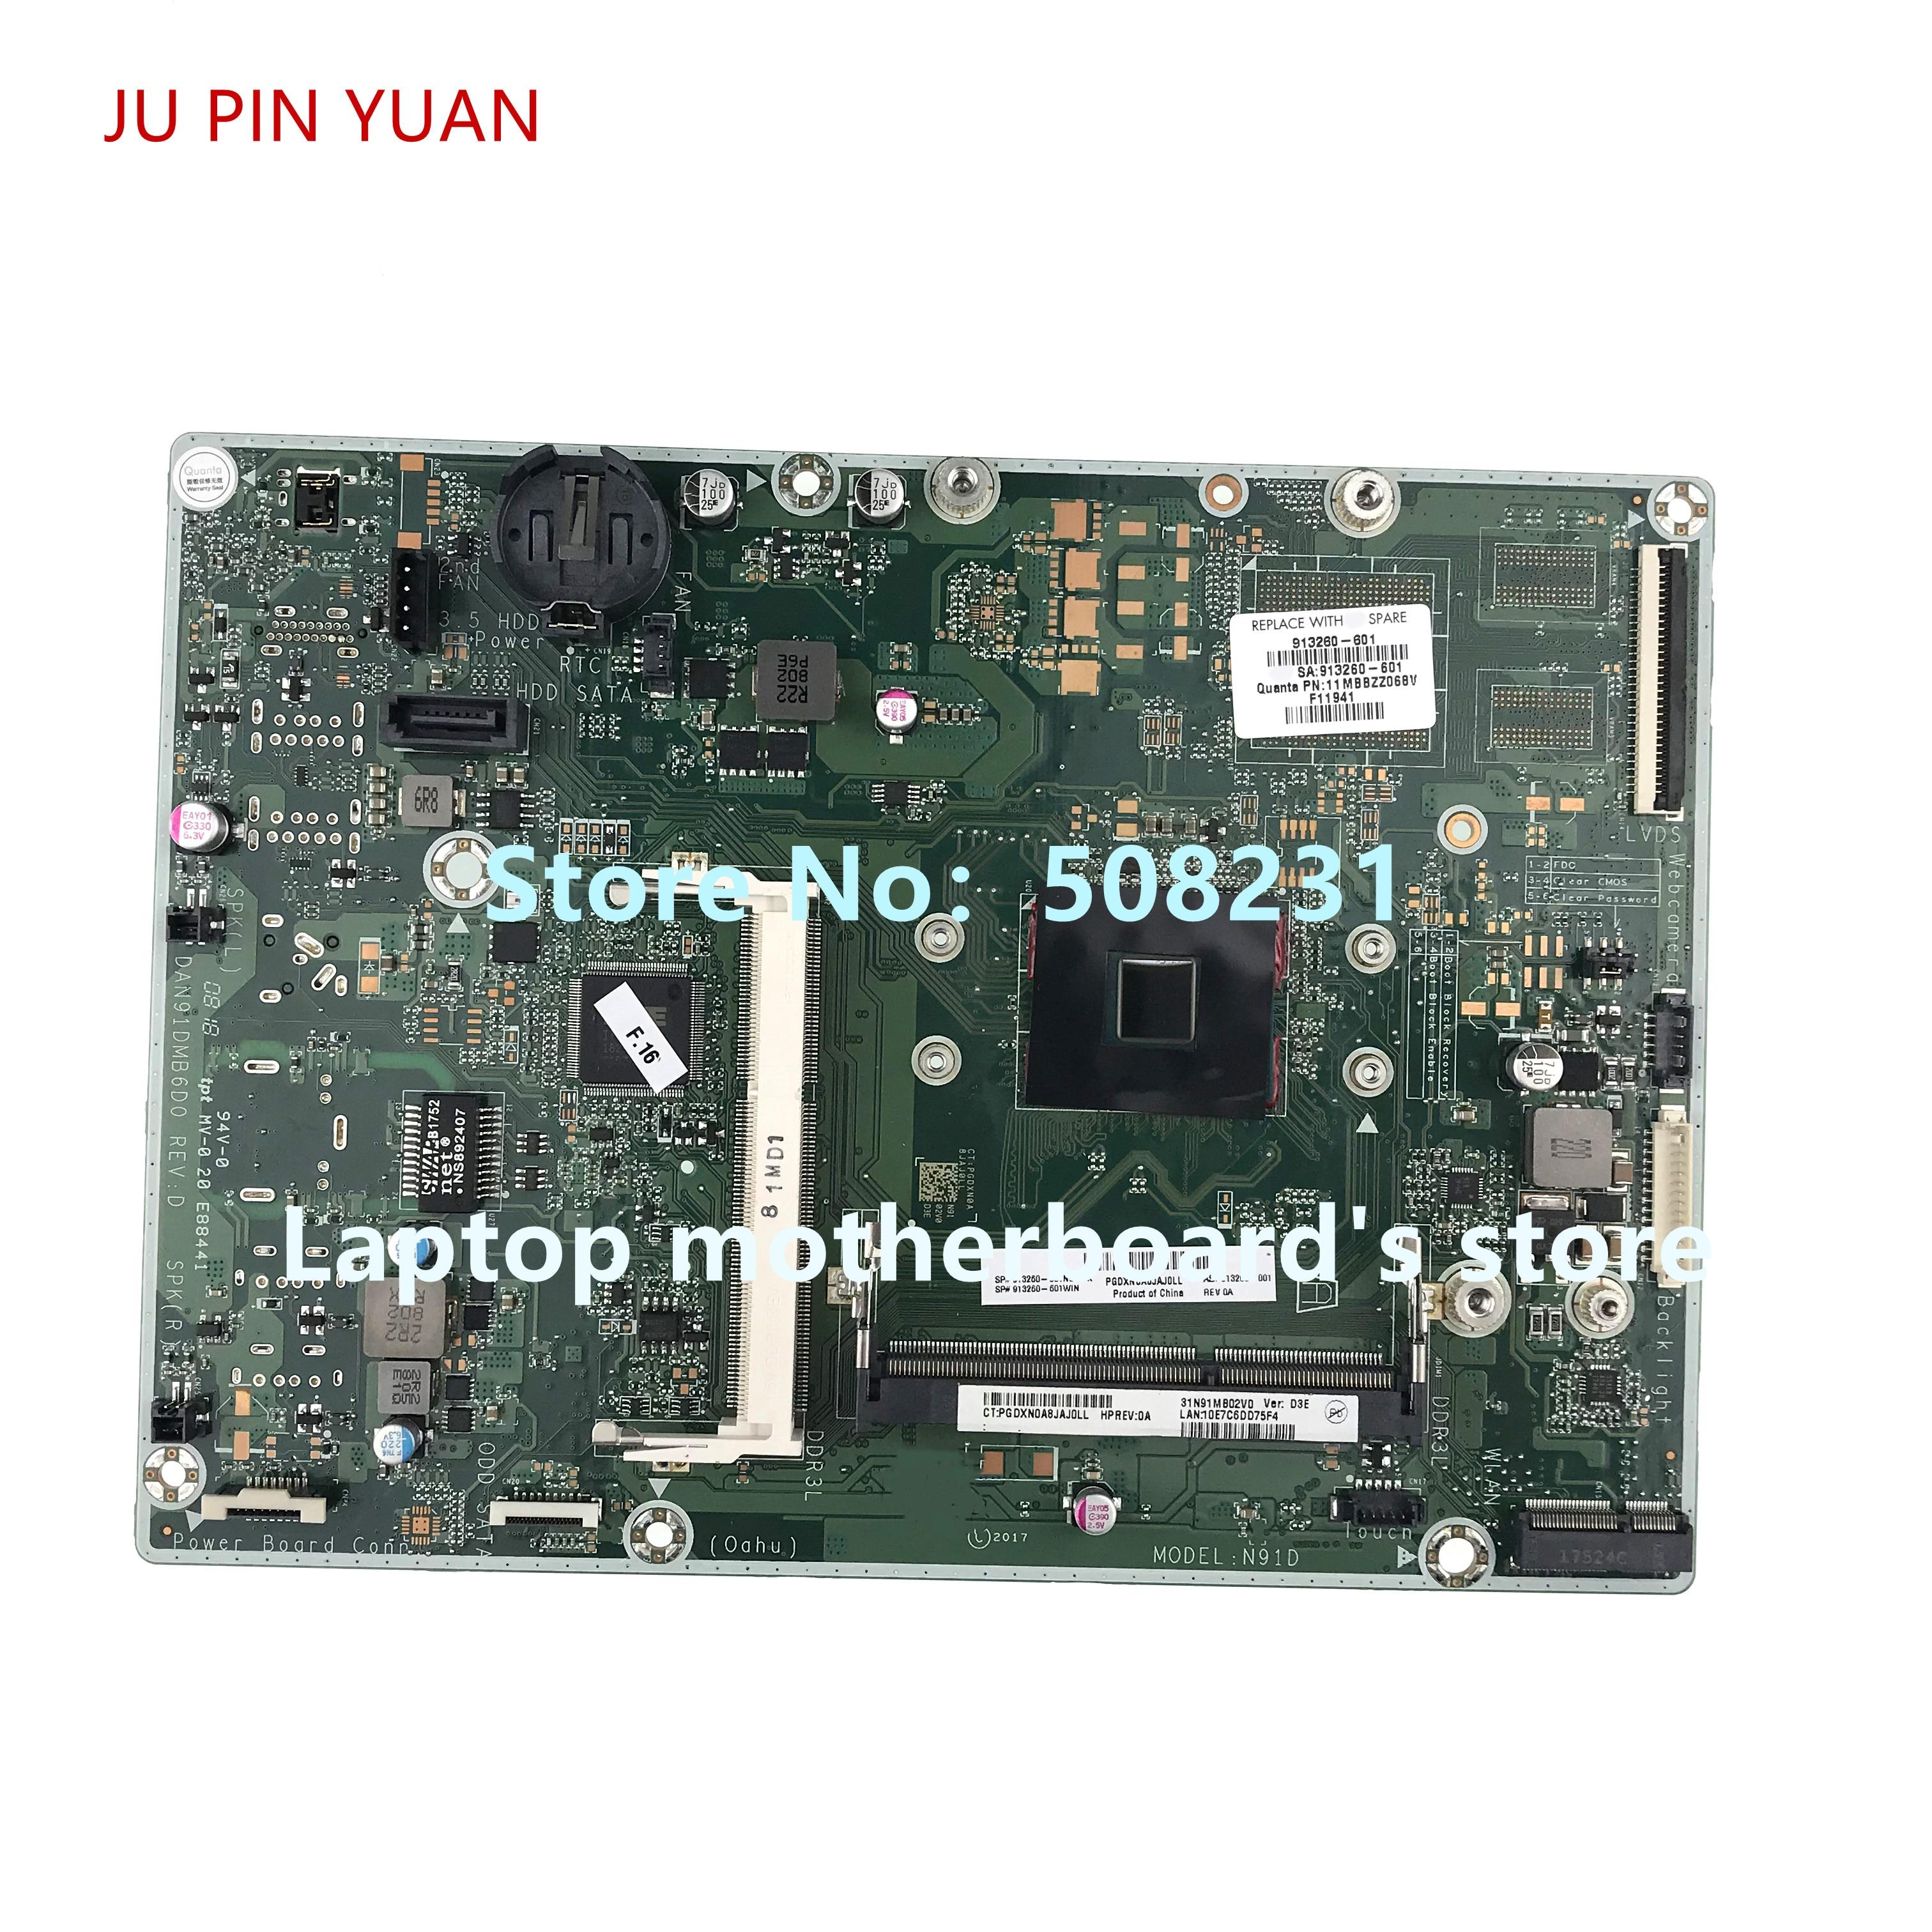 JU PIN YUAN-اللوحة الأم 913260-601 913260-001 DAN91DMB6D0 لـ HP 24-E 24-G 22-B series AIO PC 100% ، تم اختبارها بالكامل